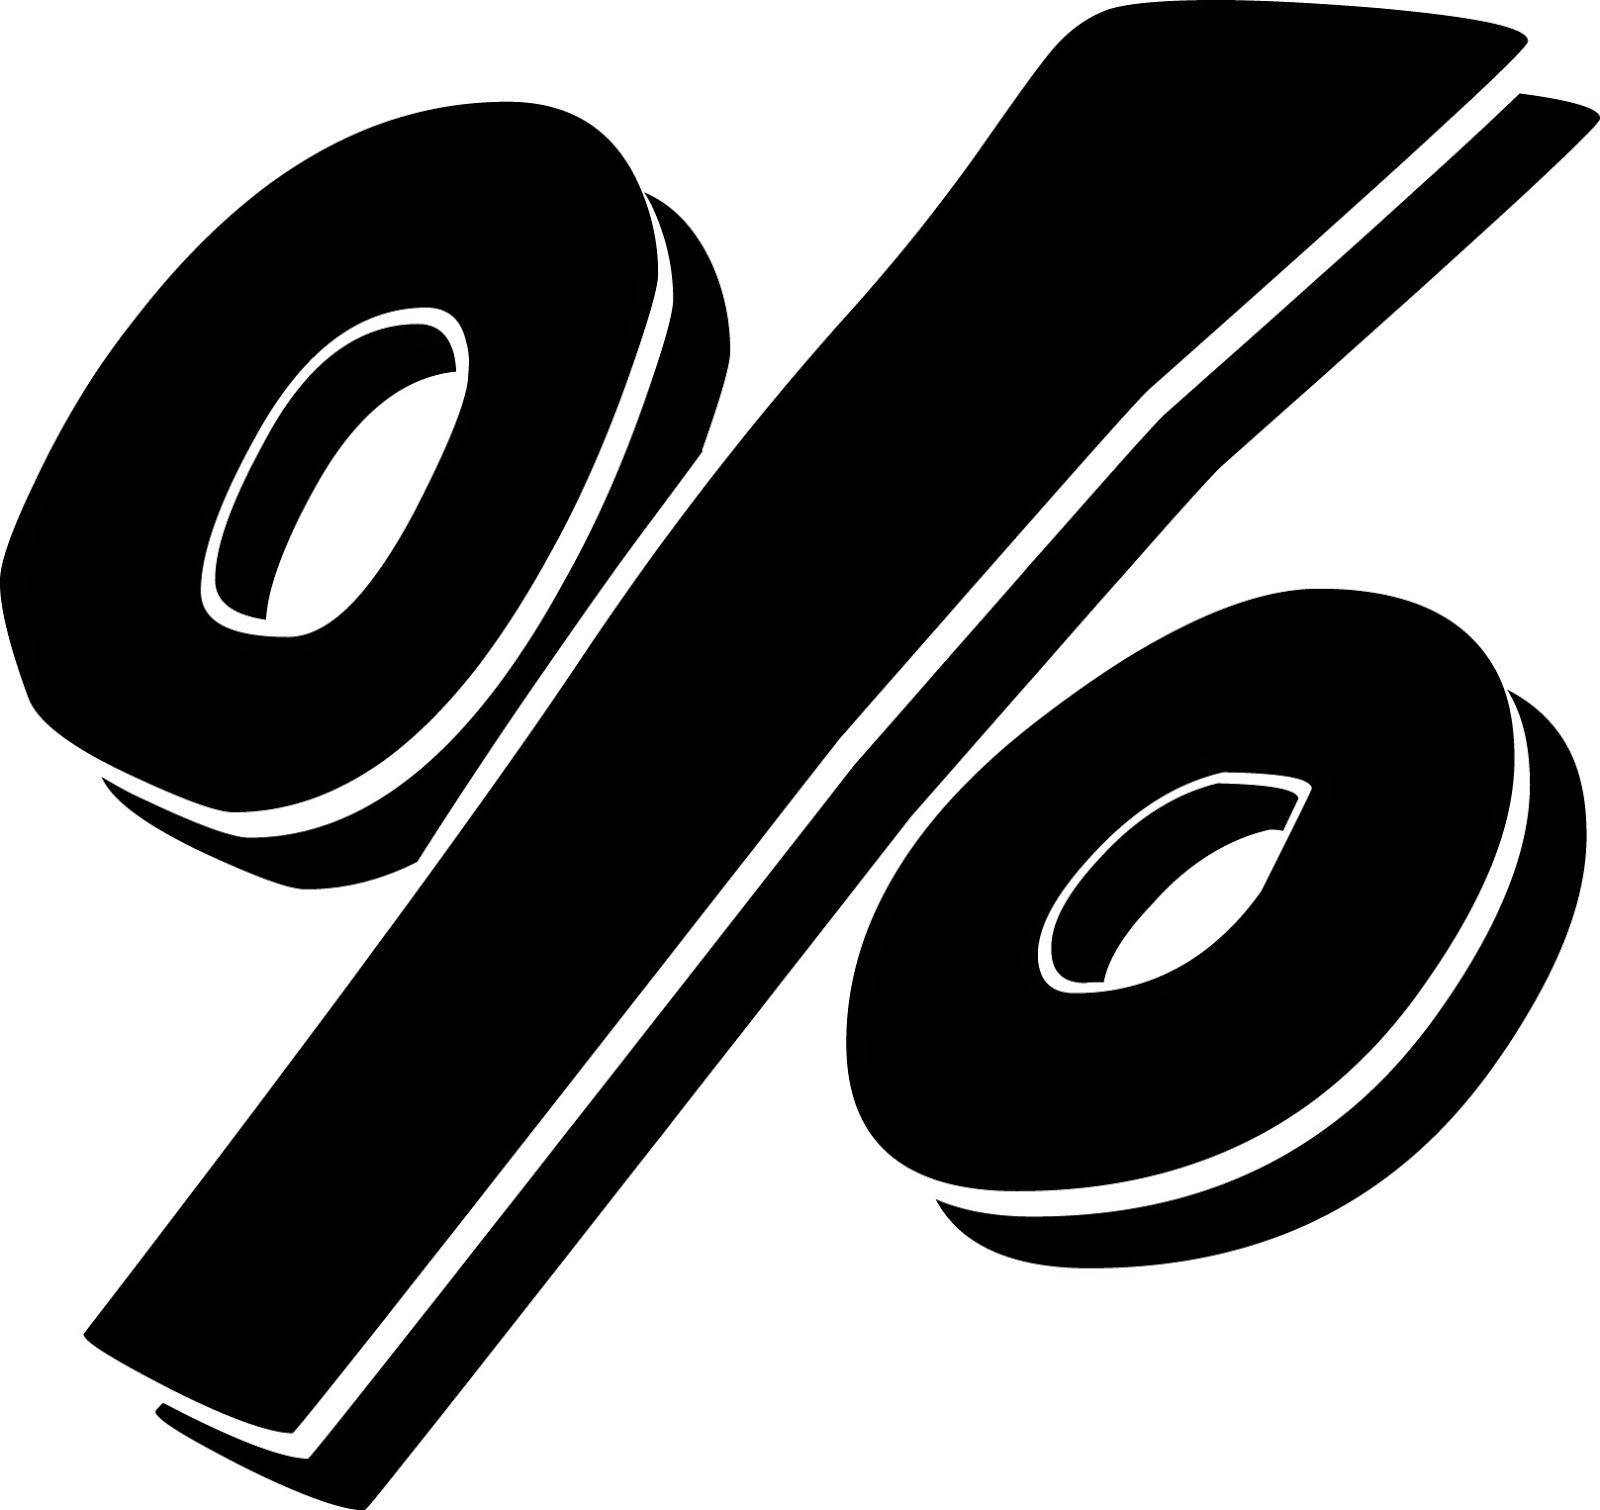 Maths homework help percentages